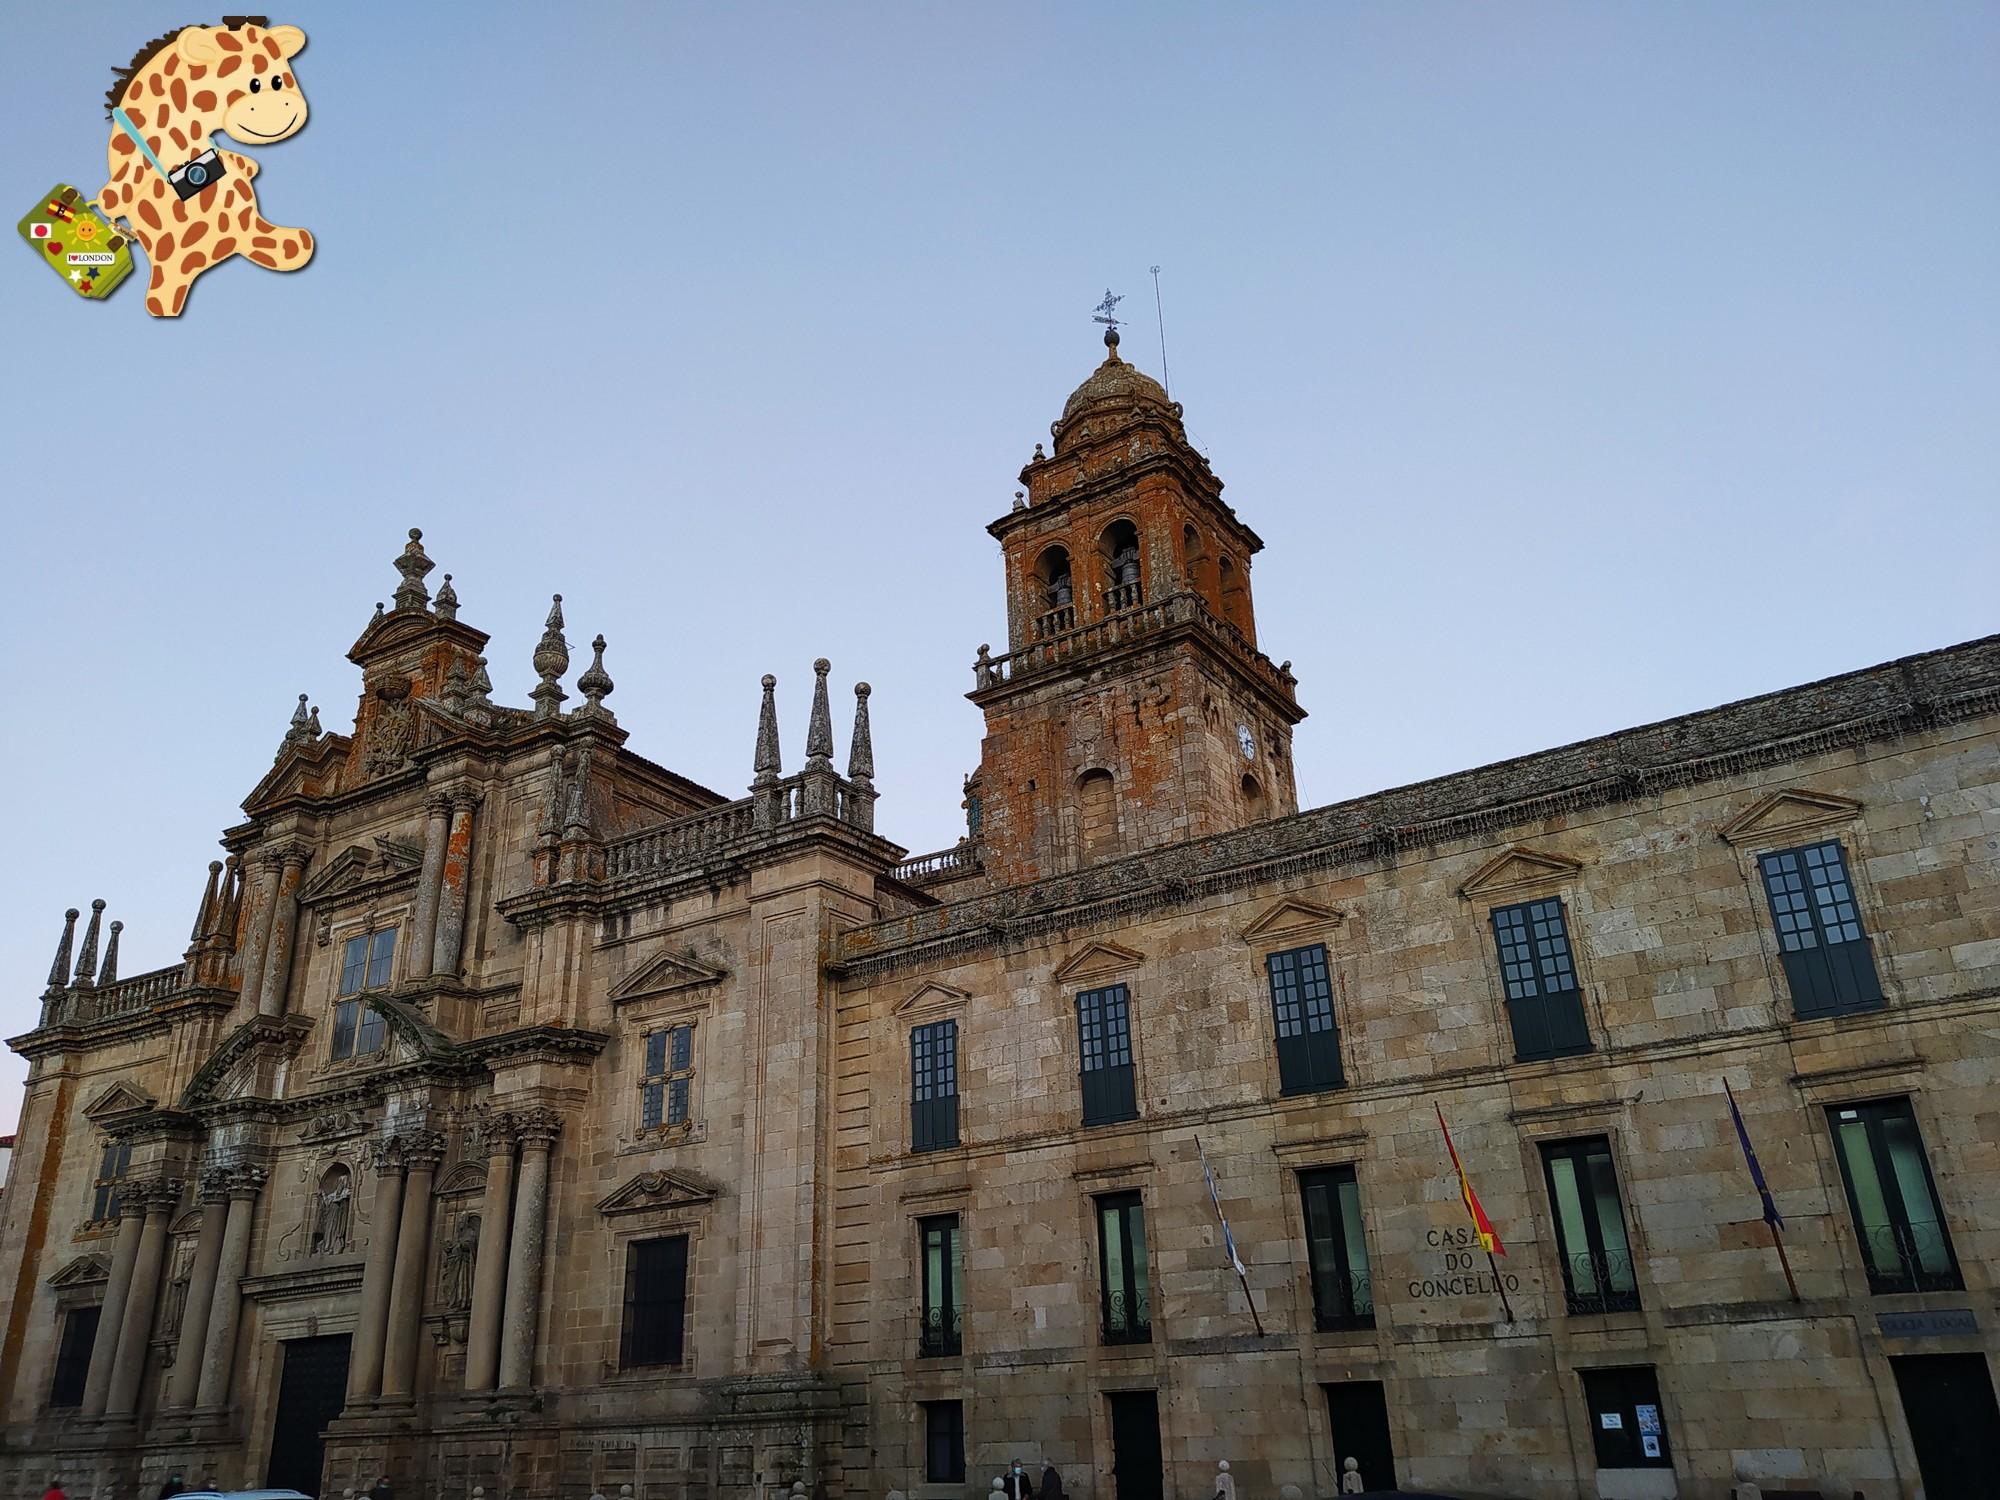 sur de ourense pontedeva e pazos de arenteiro 7 - Sur de Ourense: senderismo en Pontedeva y Pazos de Arenteiro